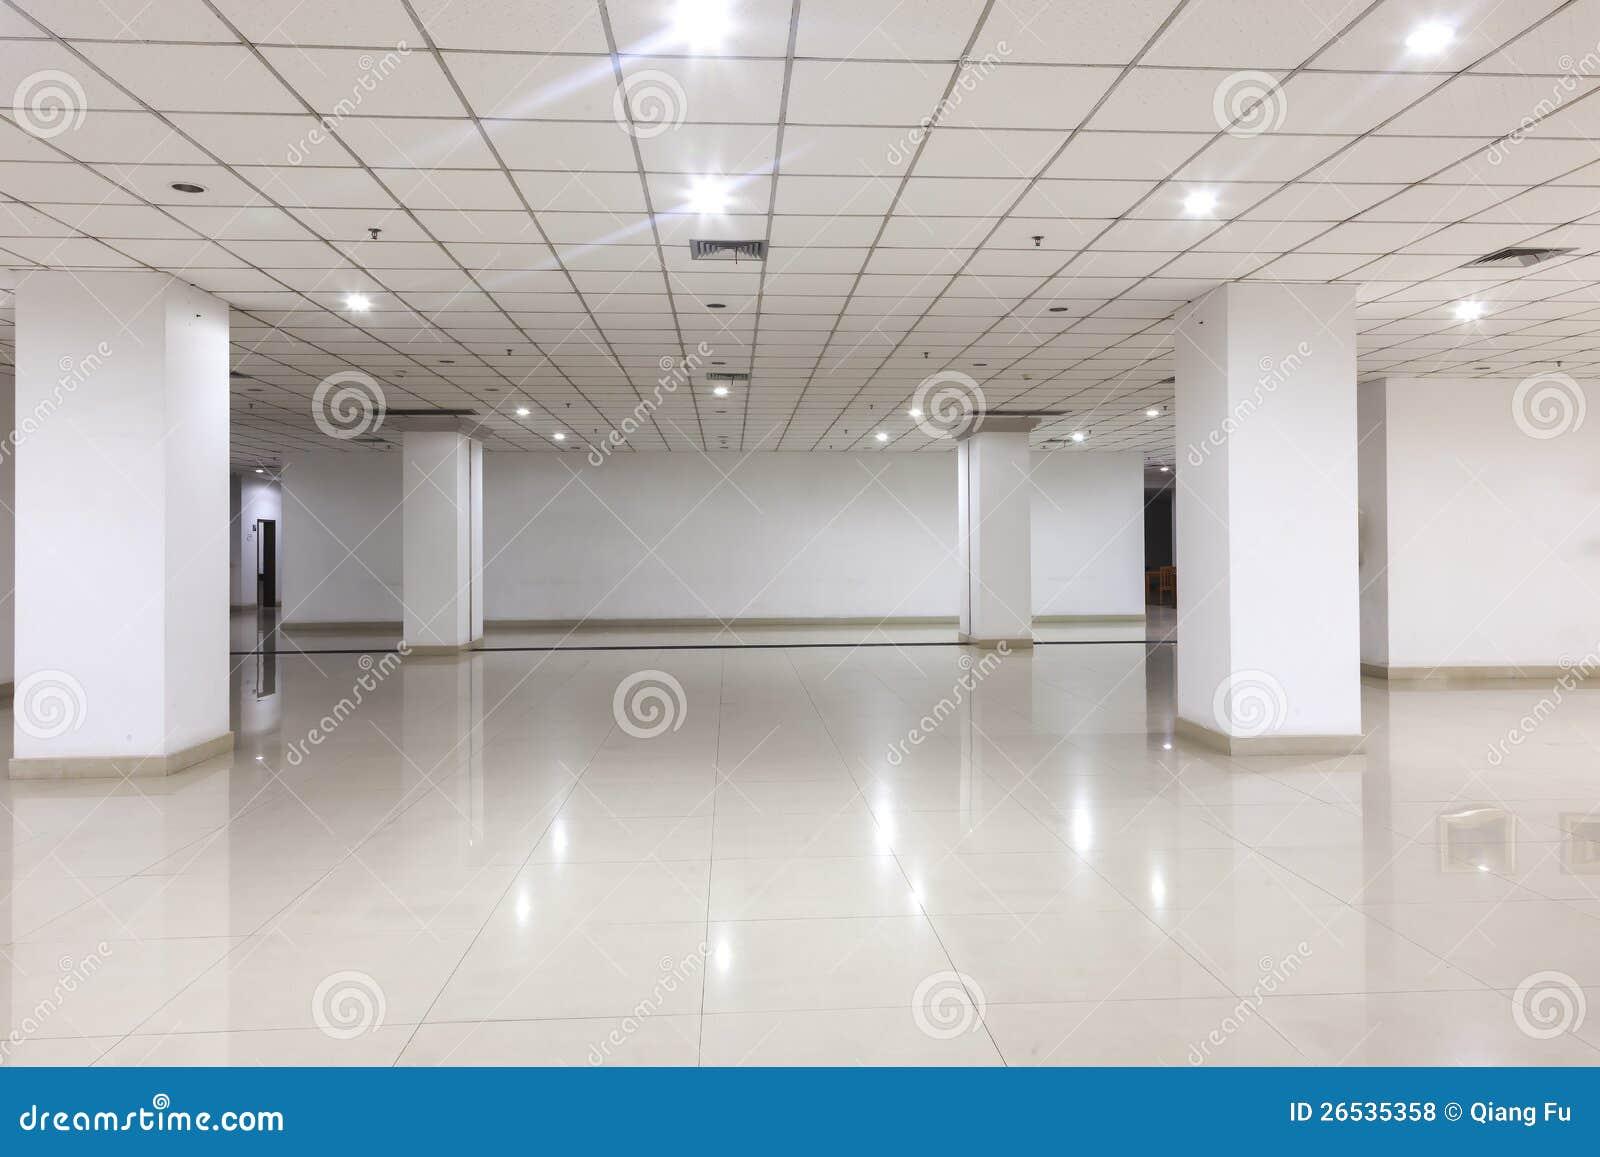 building an office. Office Building Inside An